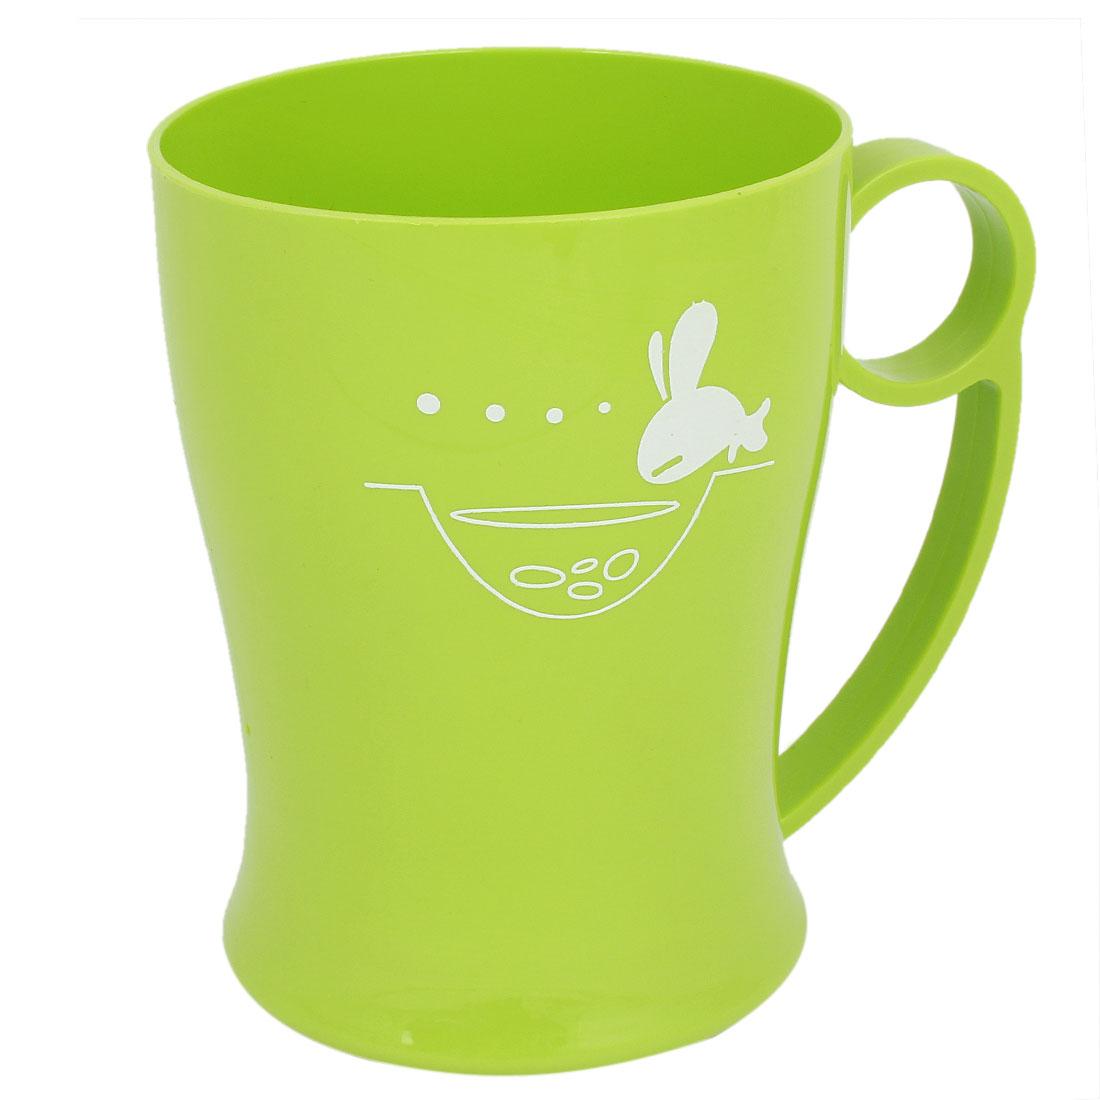 Home Household Fish Pattern Handgrip Water Bottle Gargle Toothbrush Cup Green